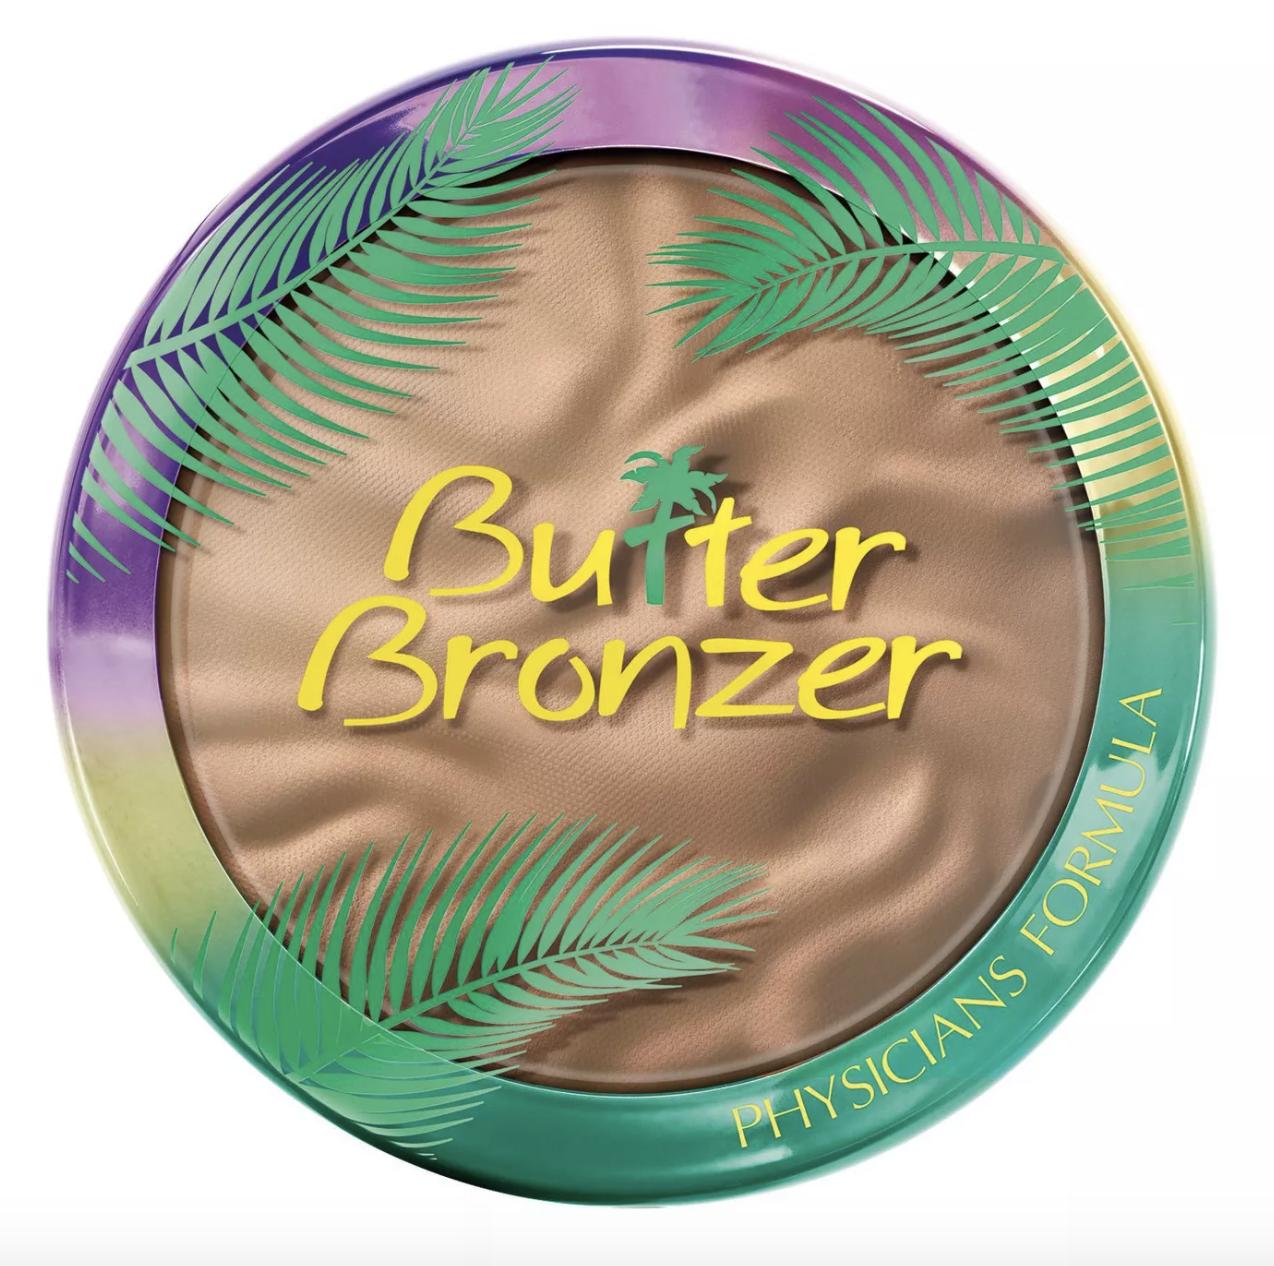 the bronzer